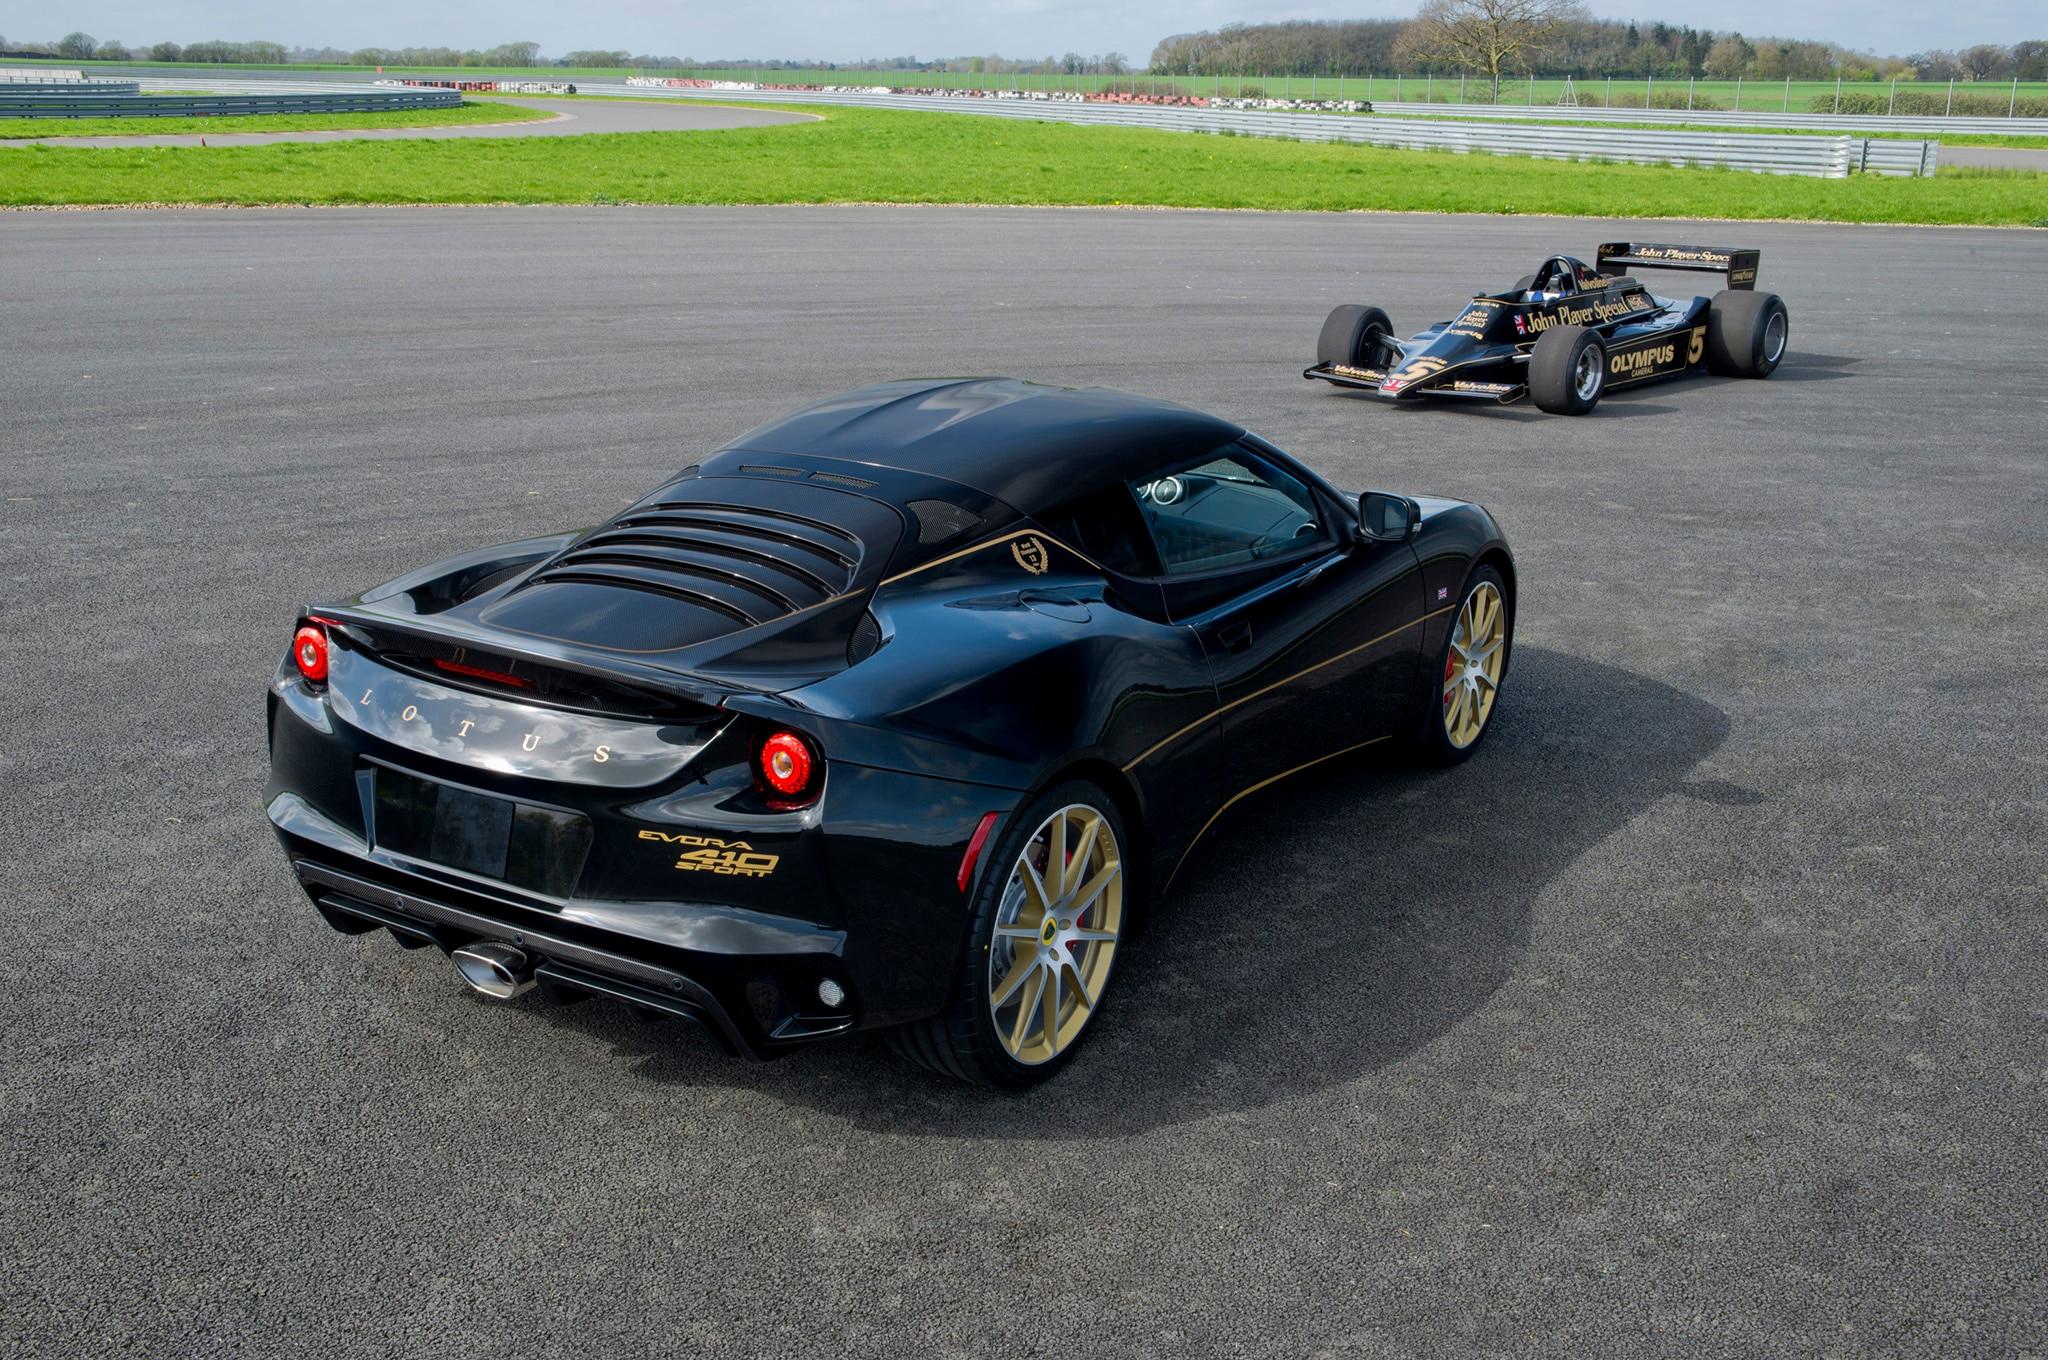 Lotus Evora Sport 410 First Drive Review Automobile Magazine